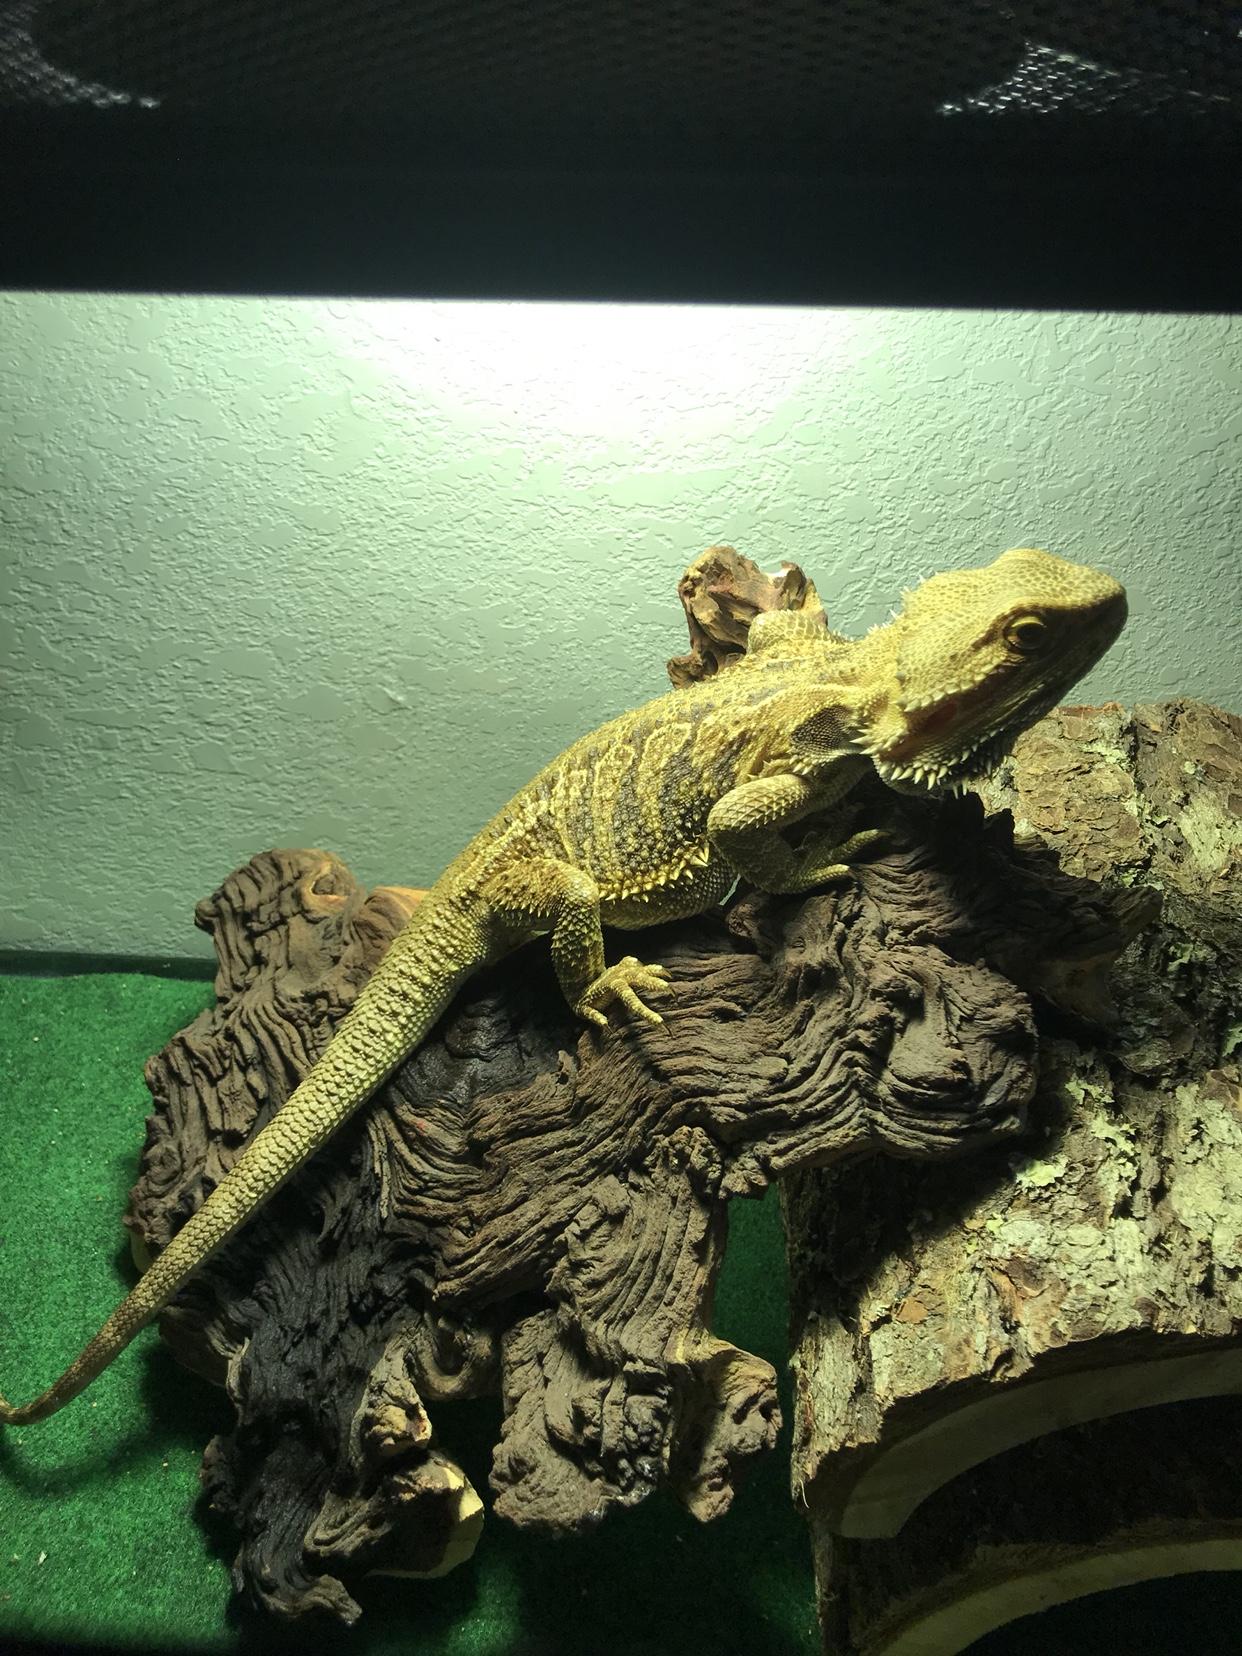 Baby Bearded Dragon For Sale Craigslist